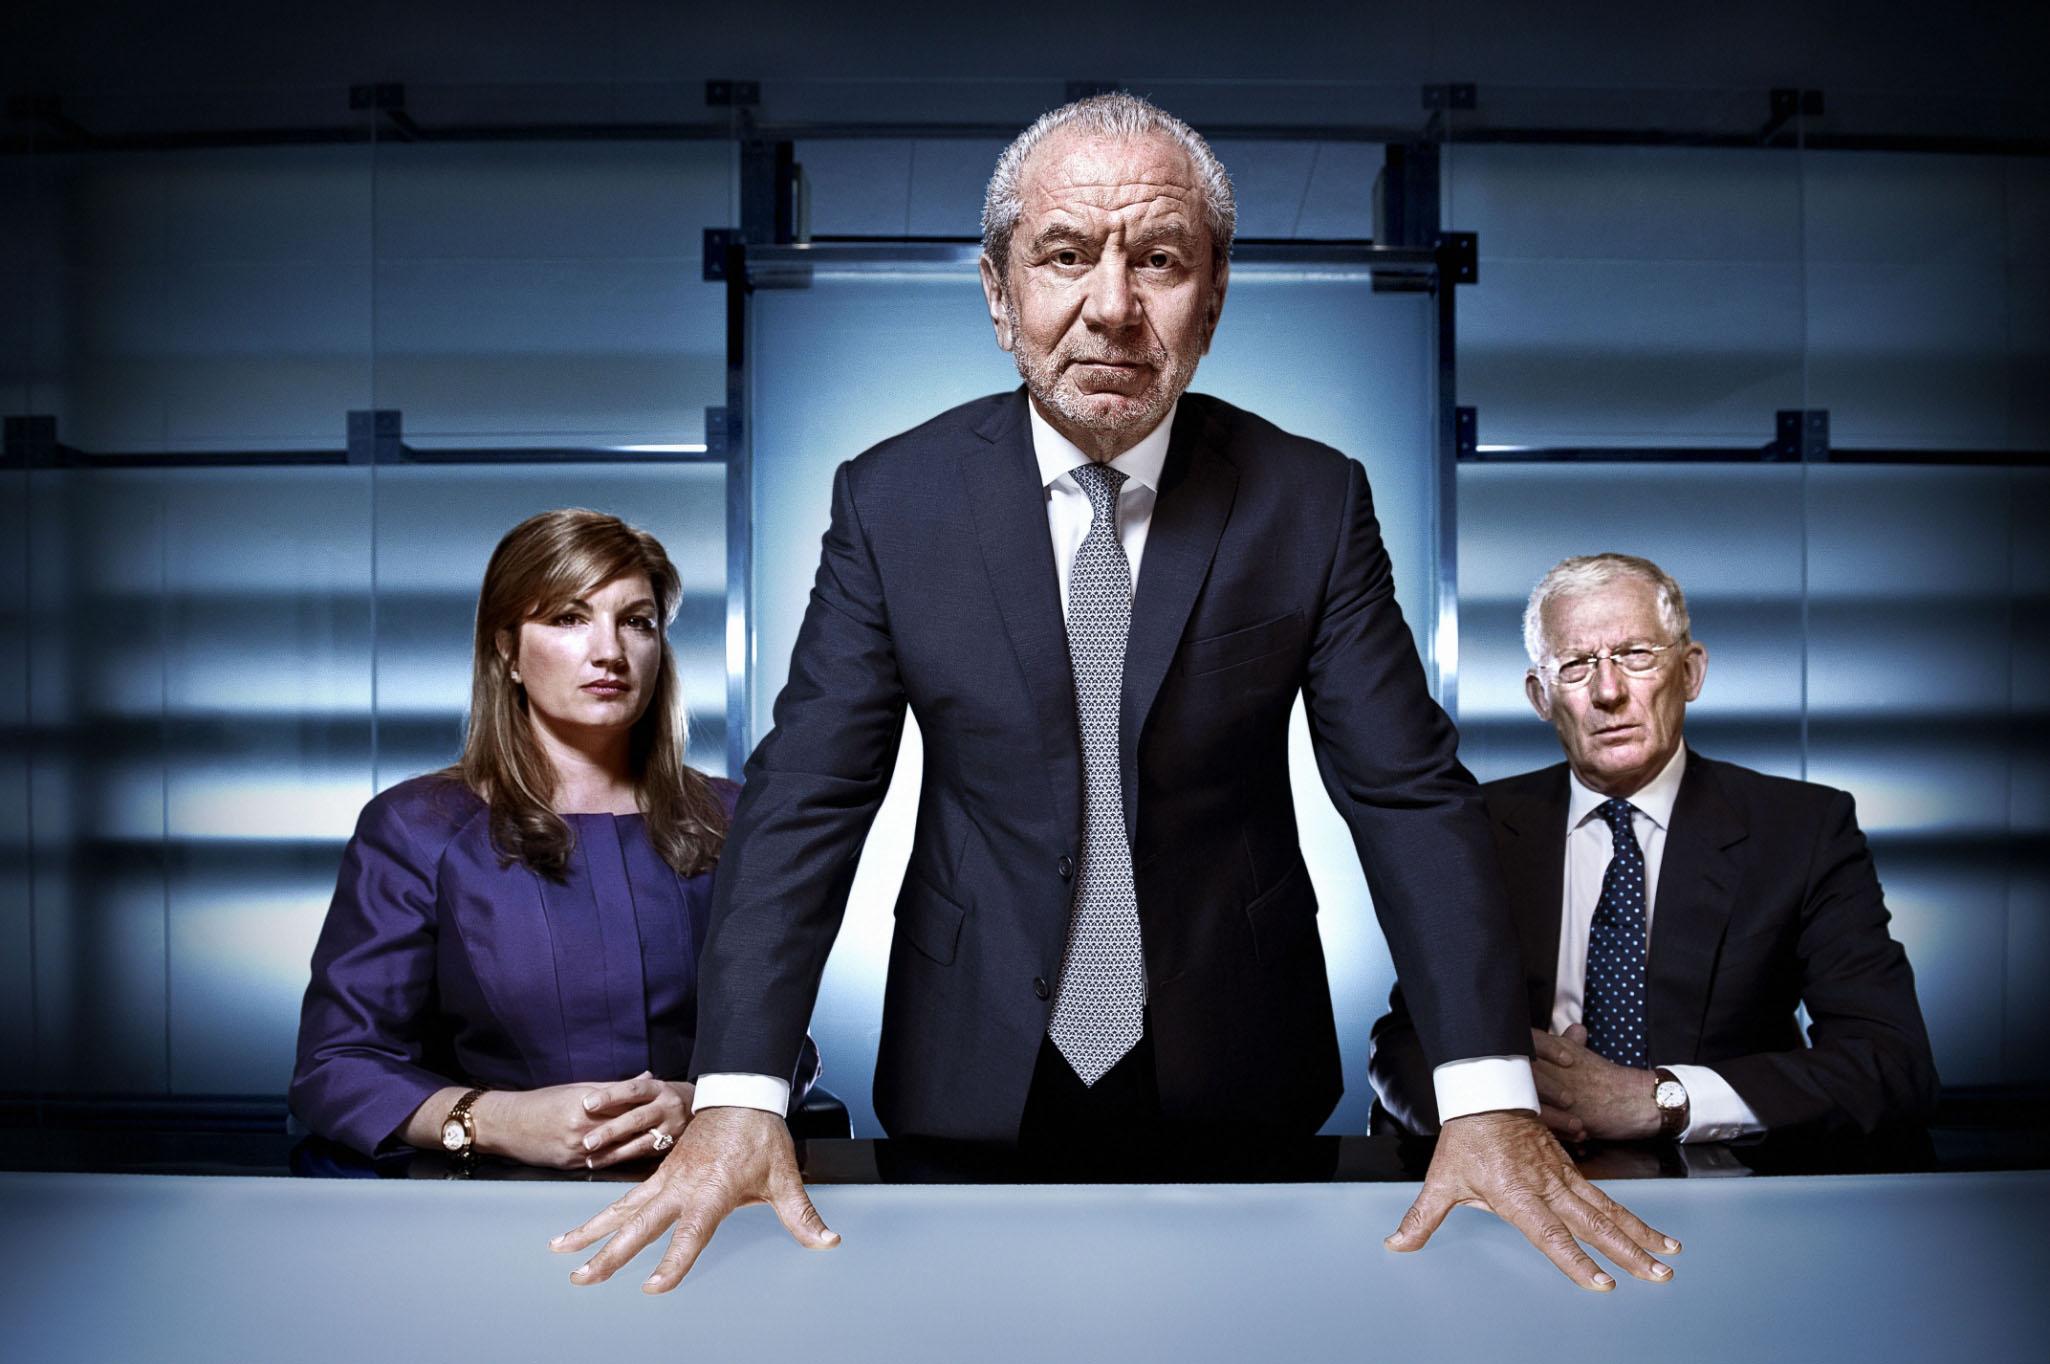 The Apprentice 2011: Preview